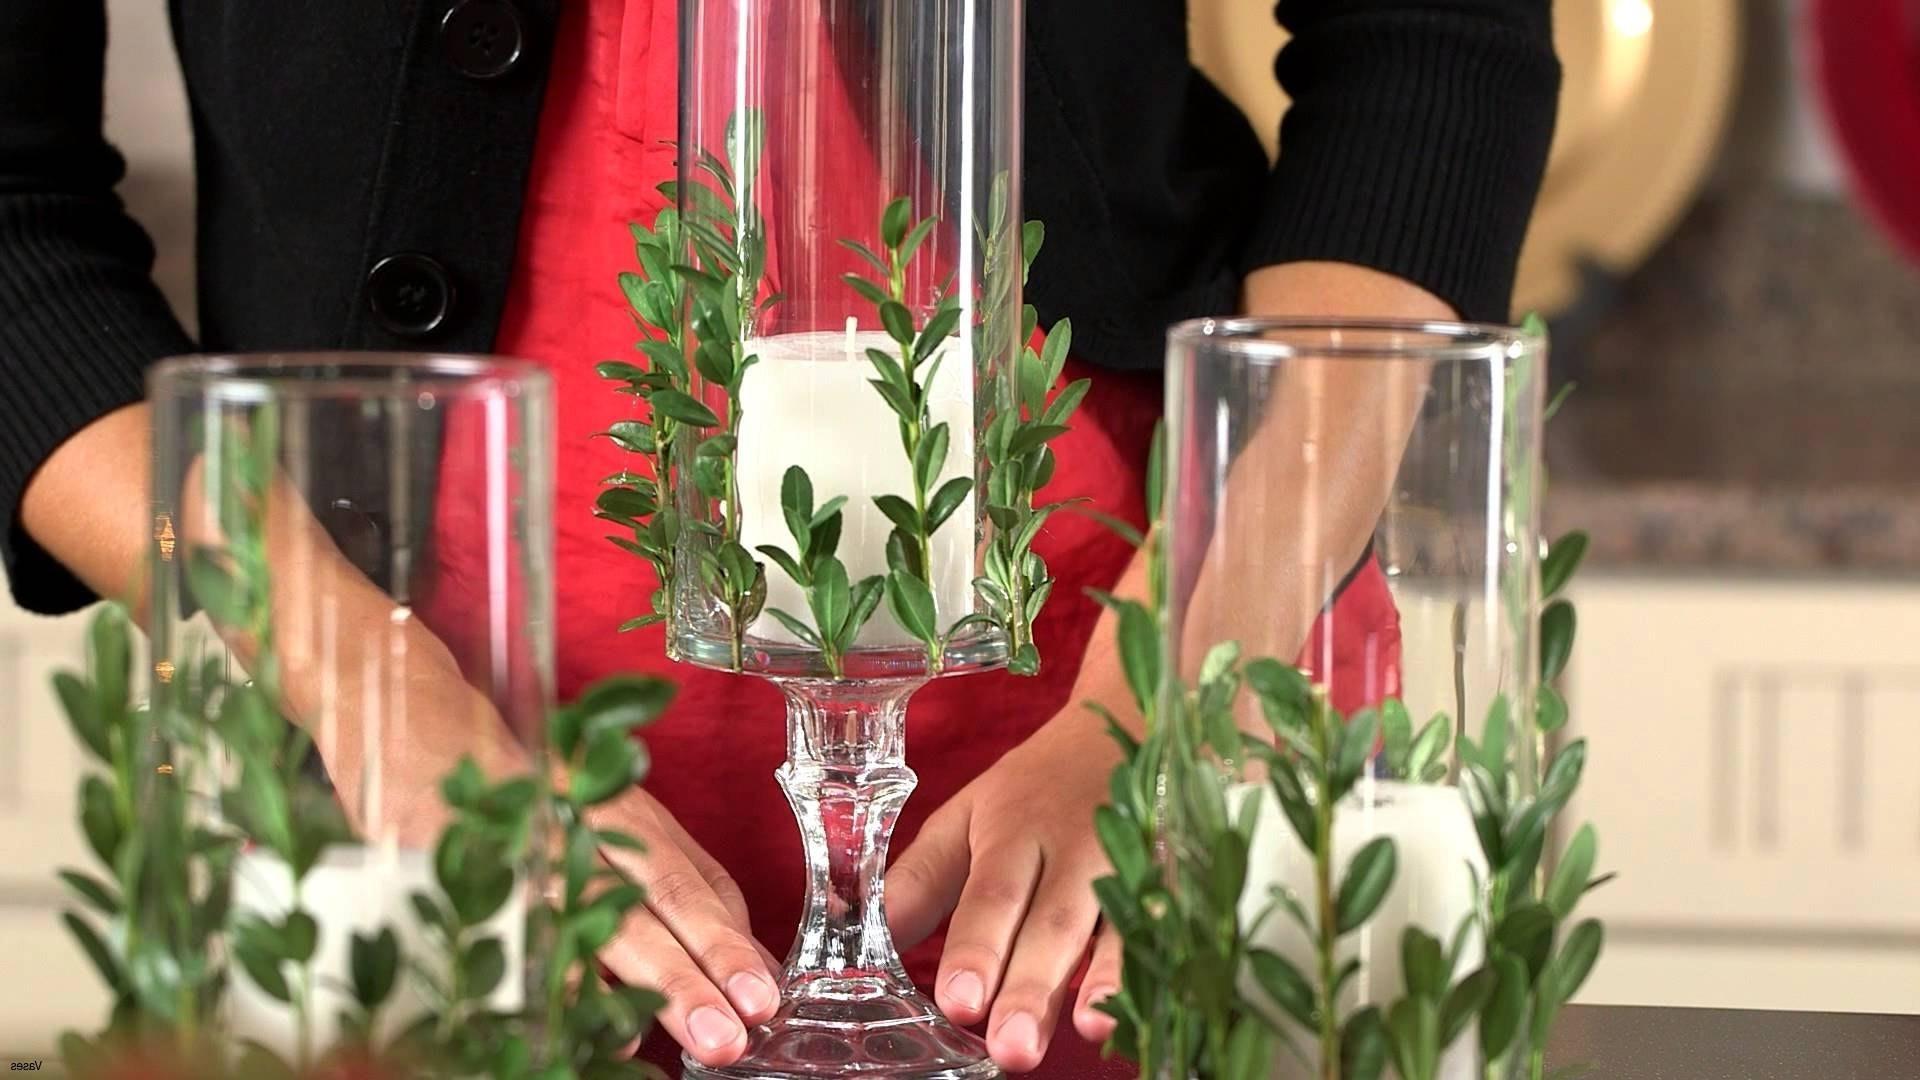 white lily vase of wedding decoration flowers ideas simple dollar tree wedding in wedding decoration flowers ideas simple dollar tree wedding decorations awesome h vases dollar vase i 0d